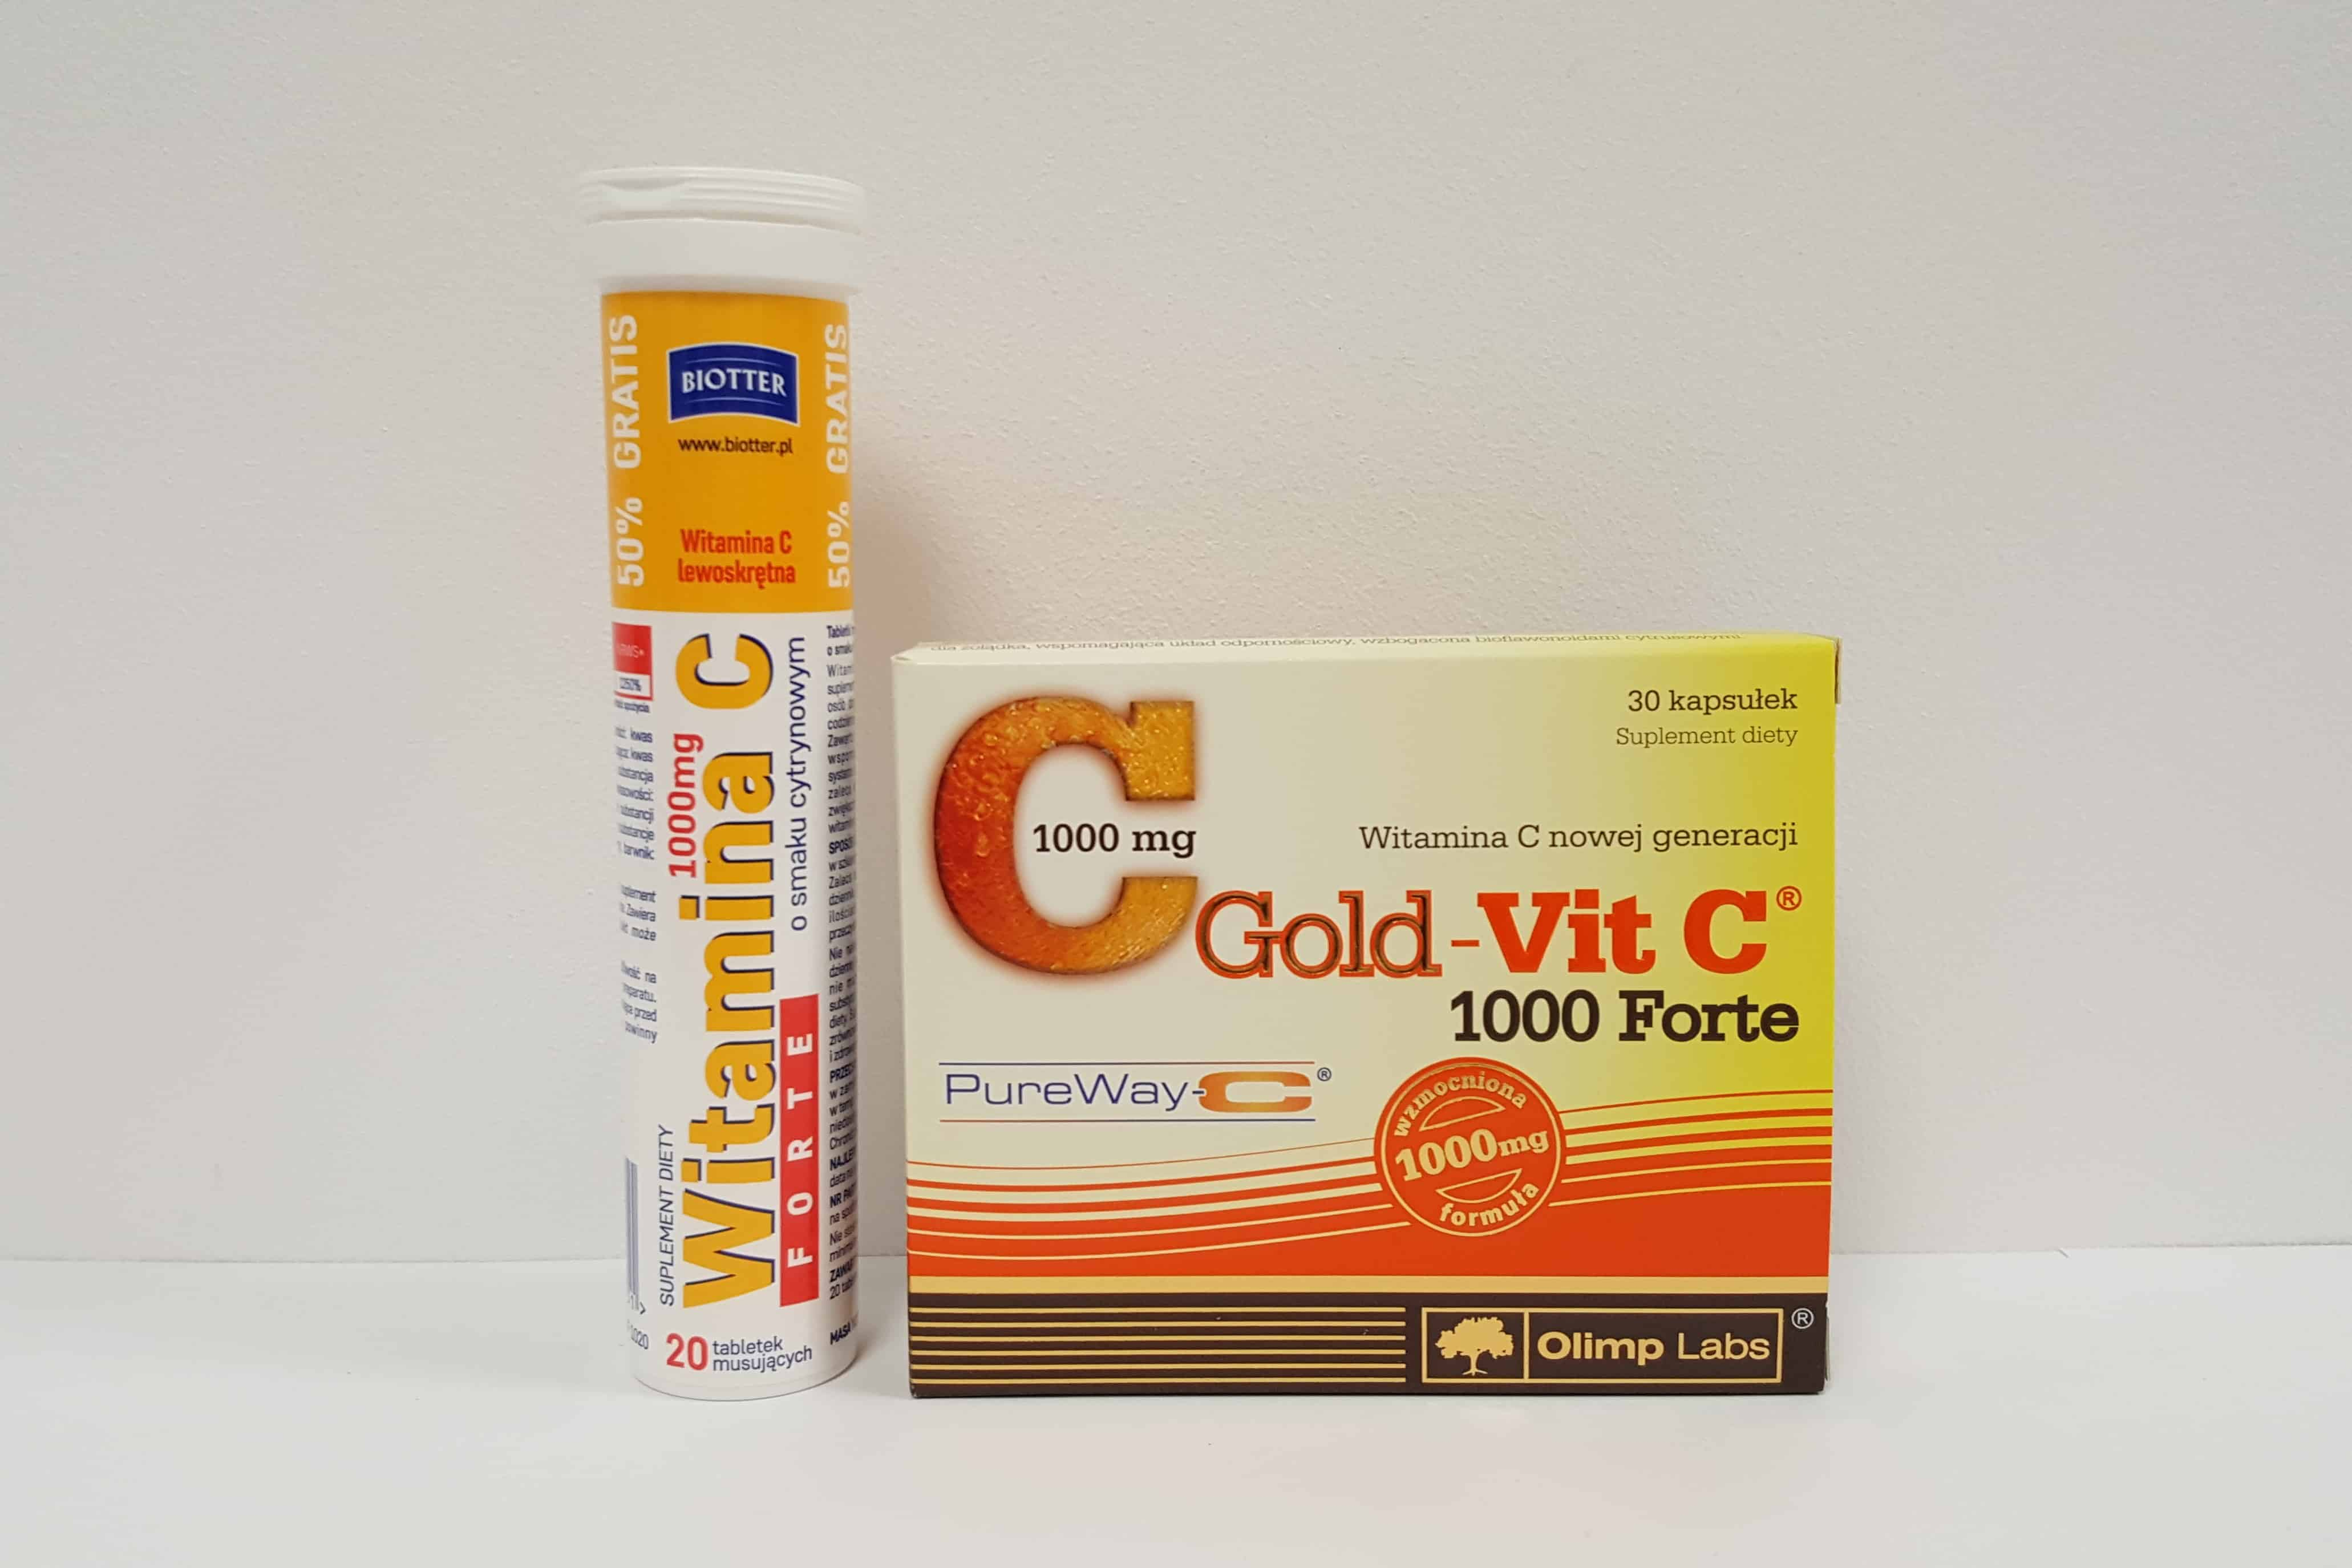 Witamina C 1000 mg Matka Aptekarka